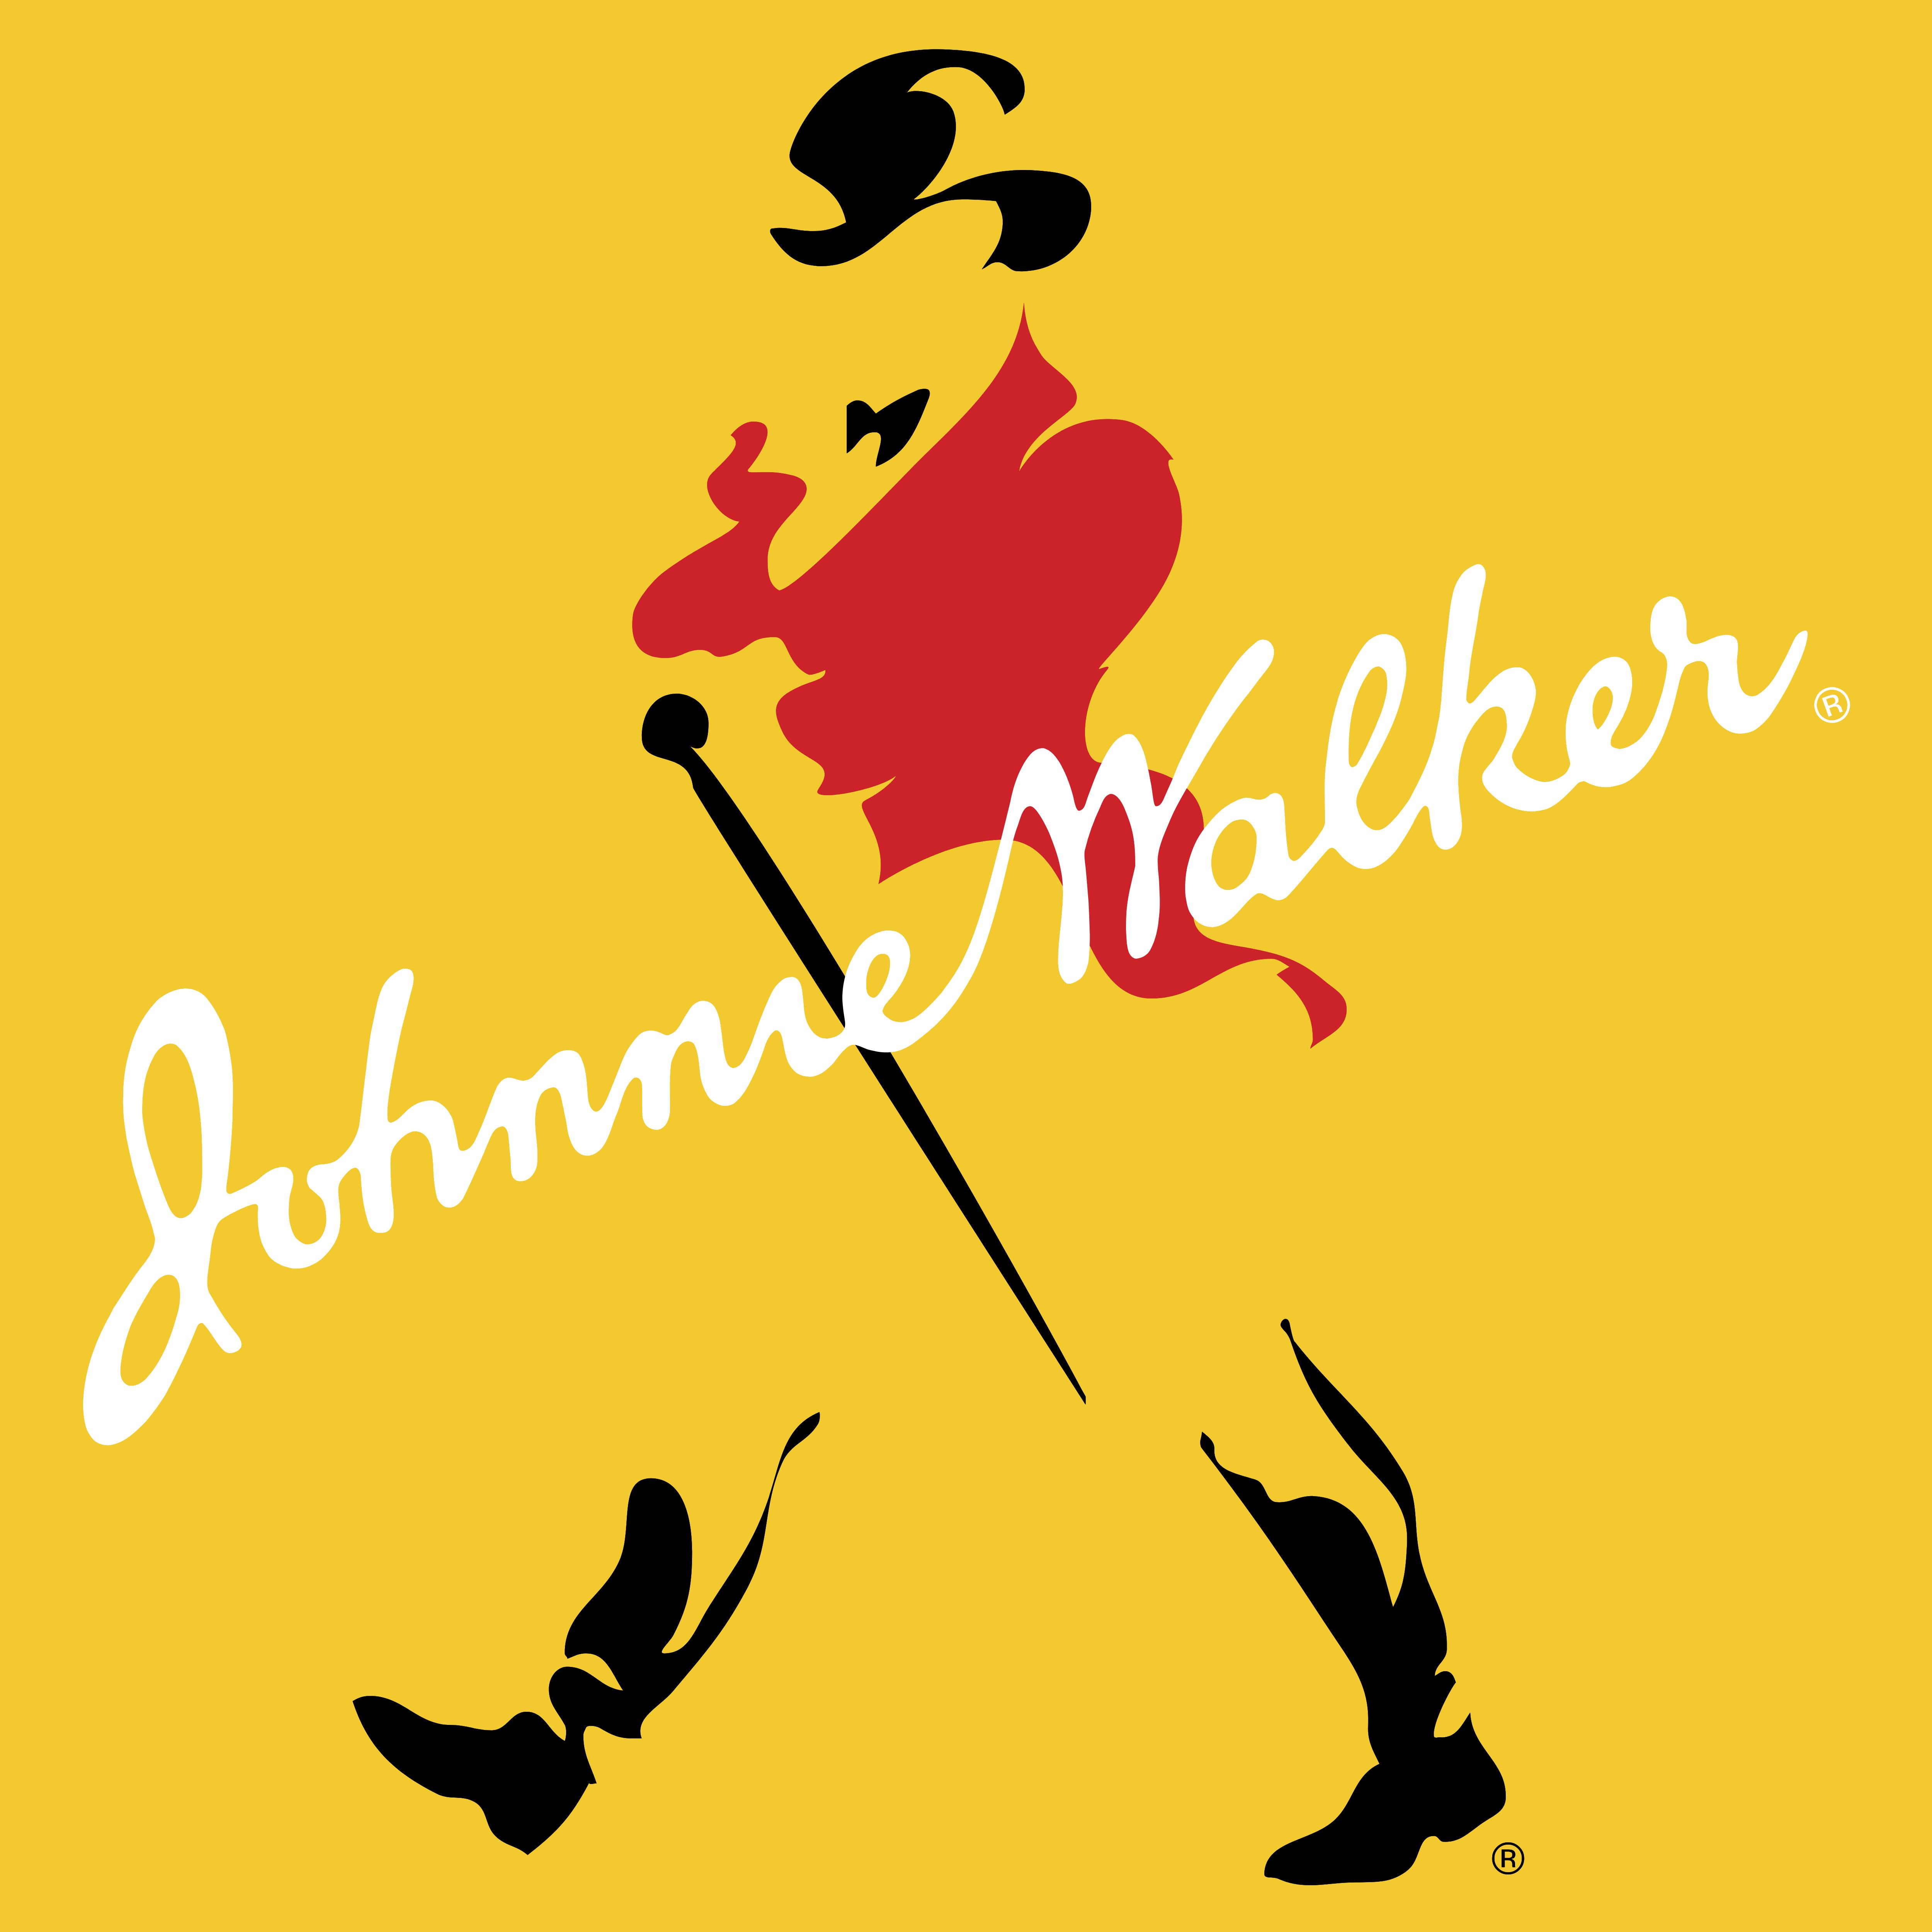 johnnie walker logos download rh logos download com johnnie walker logo 2018 johnnie walker logo in black and white